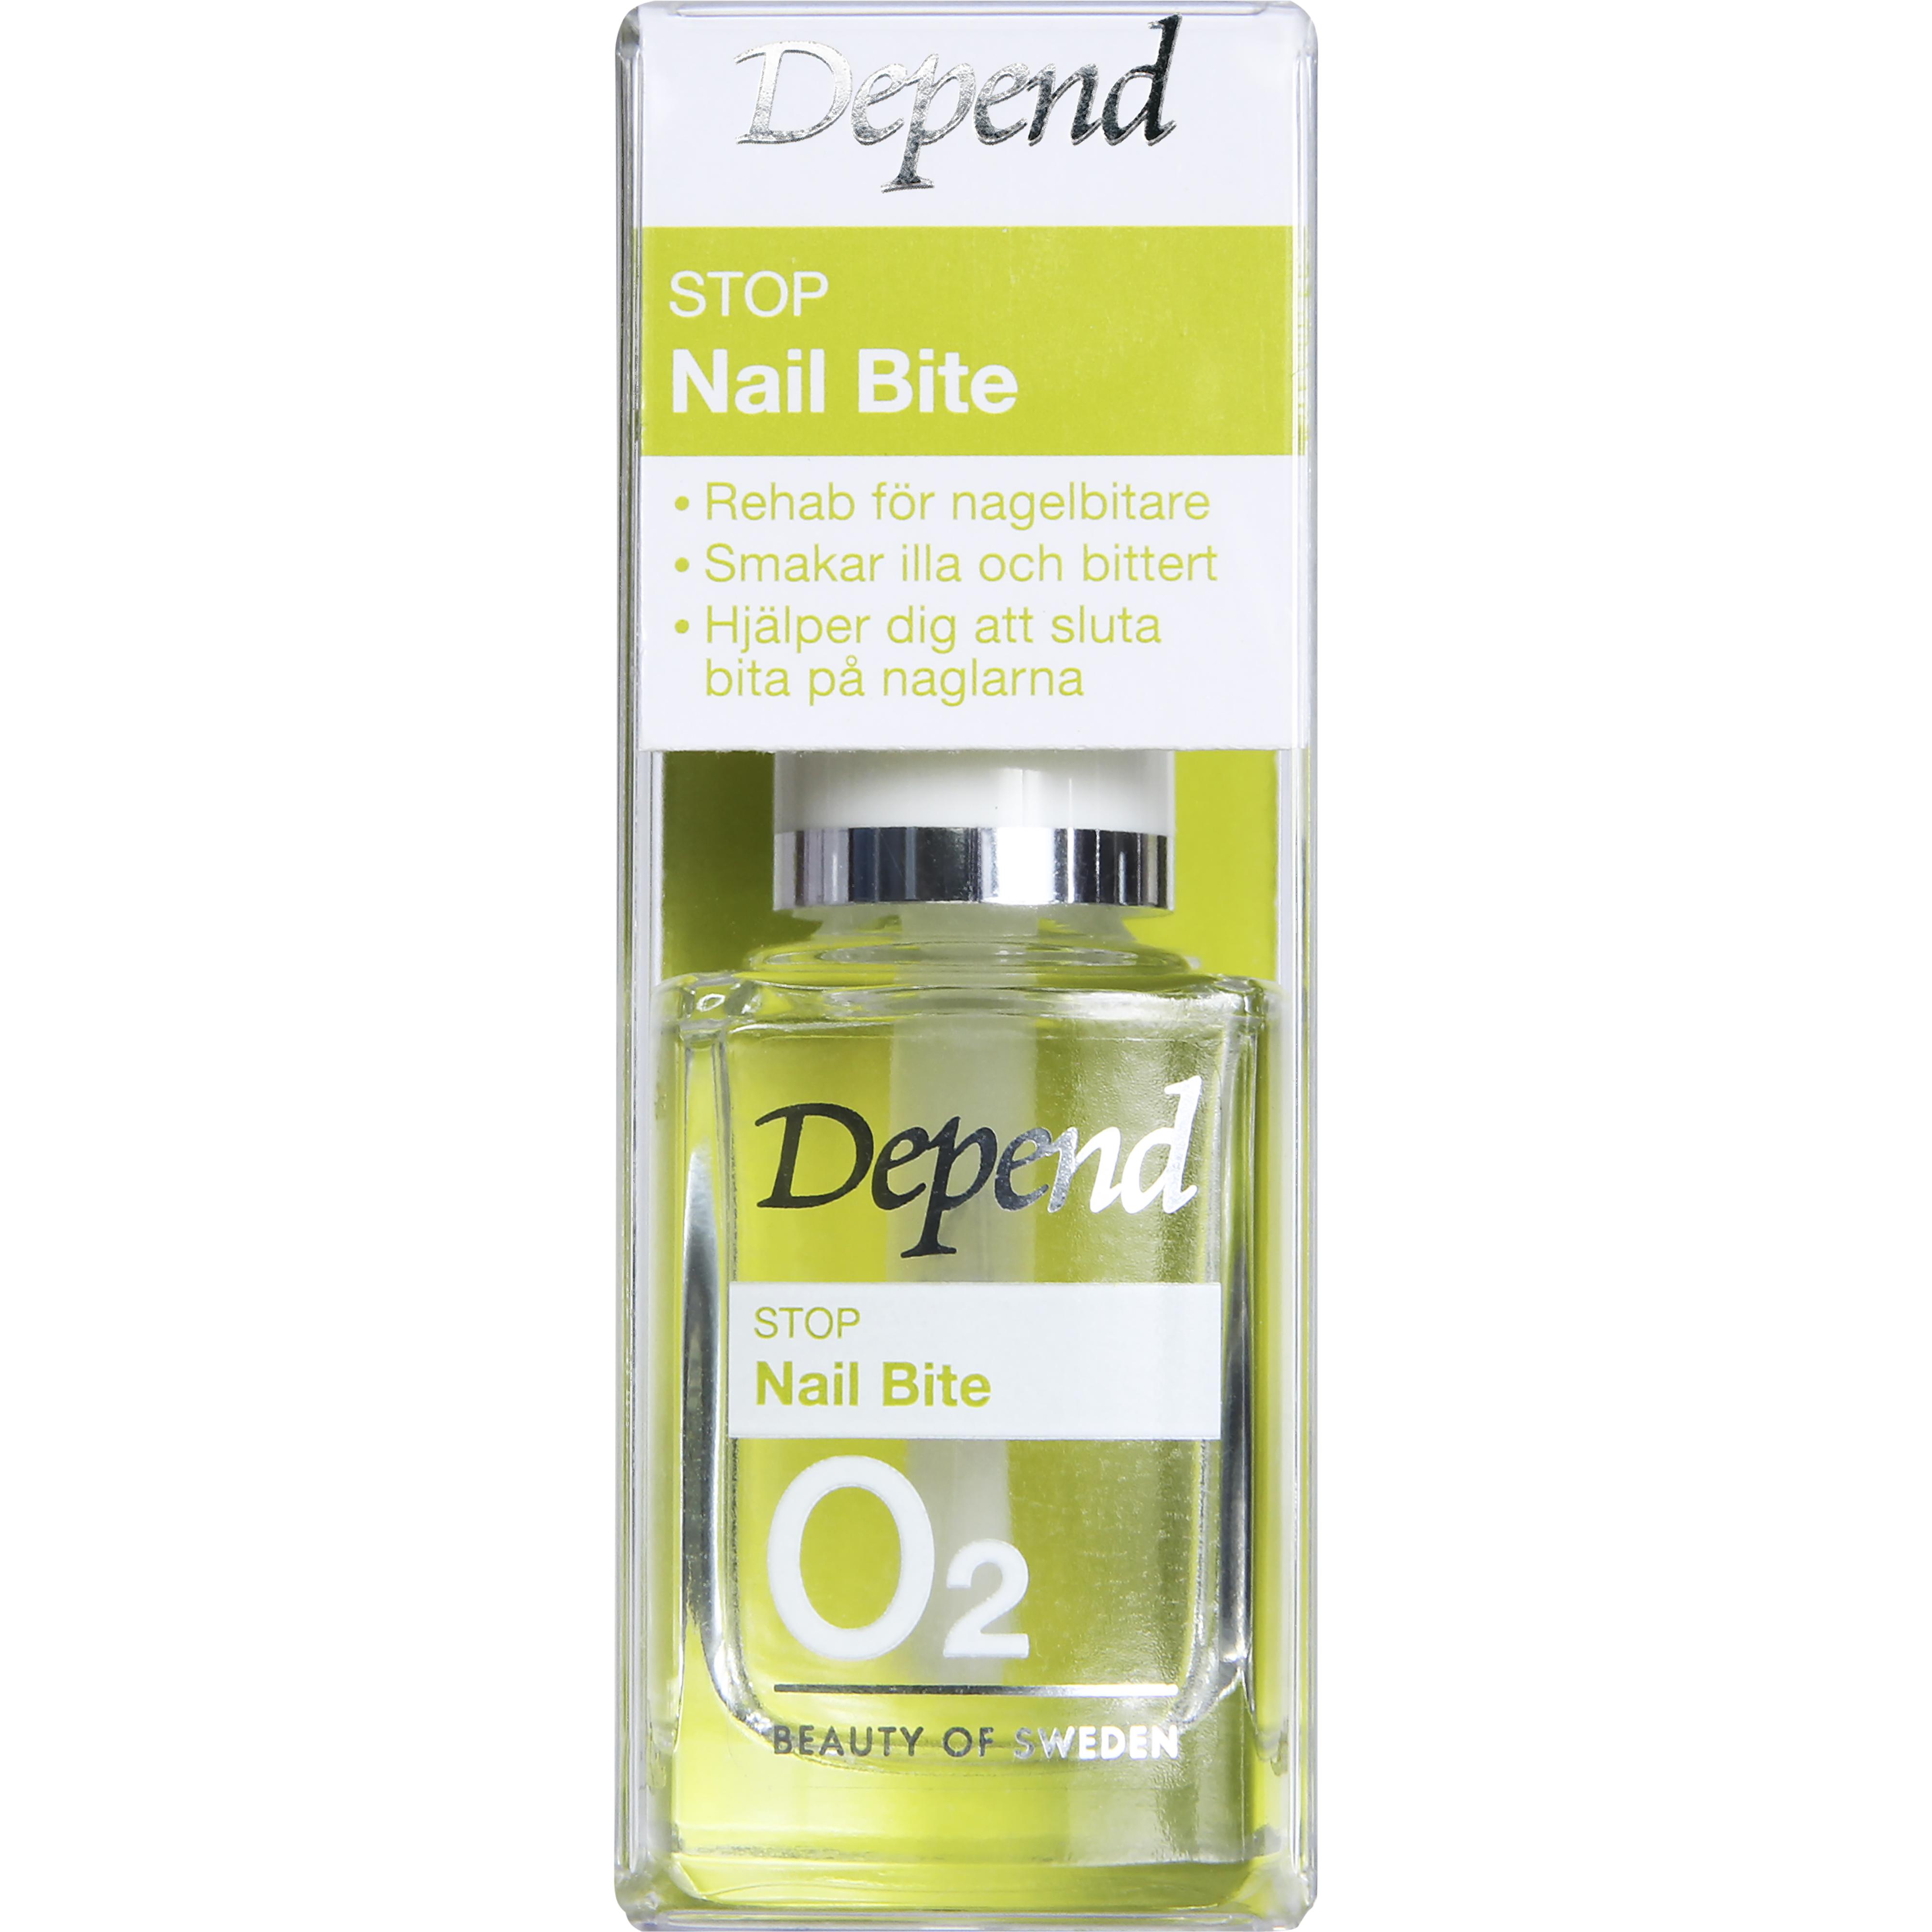 Stop Nail Bite